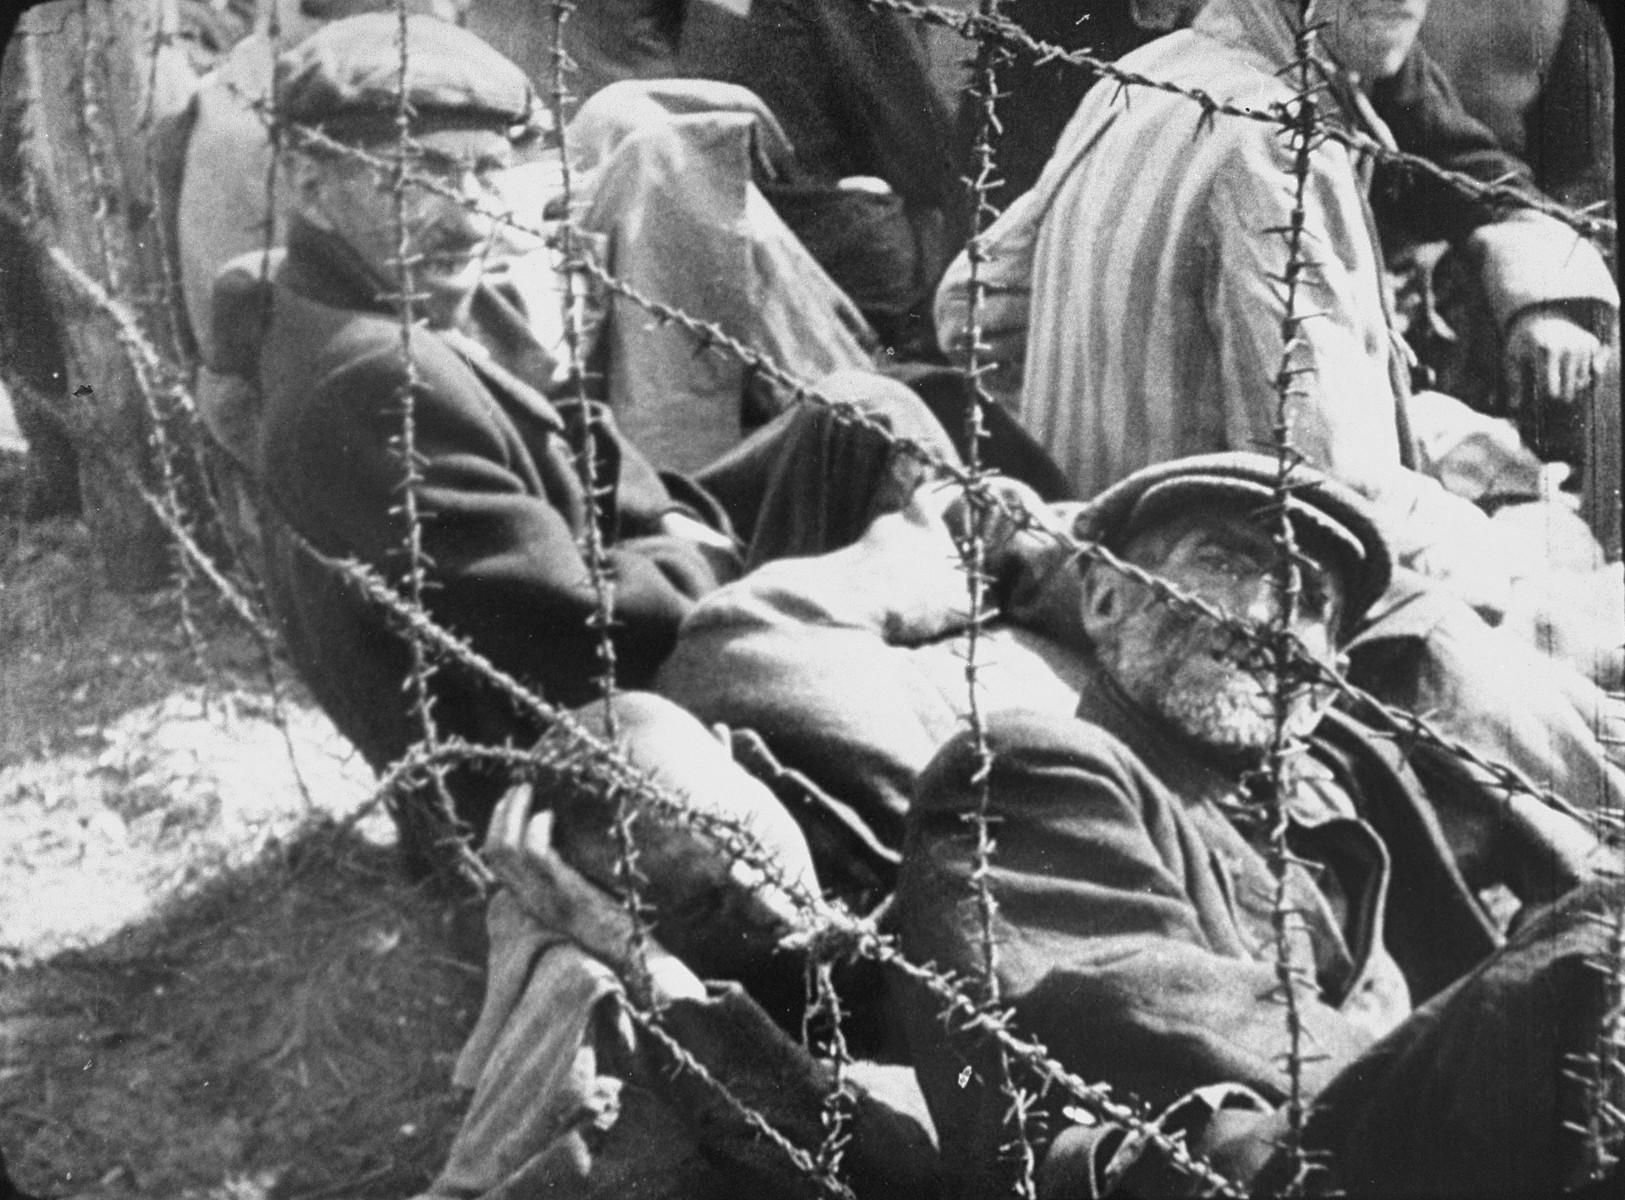 Survivors in Bergen-Belsen concentration camp rest behind a barbed wire fence after liberation.